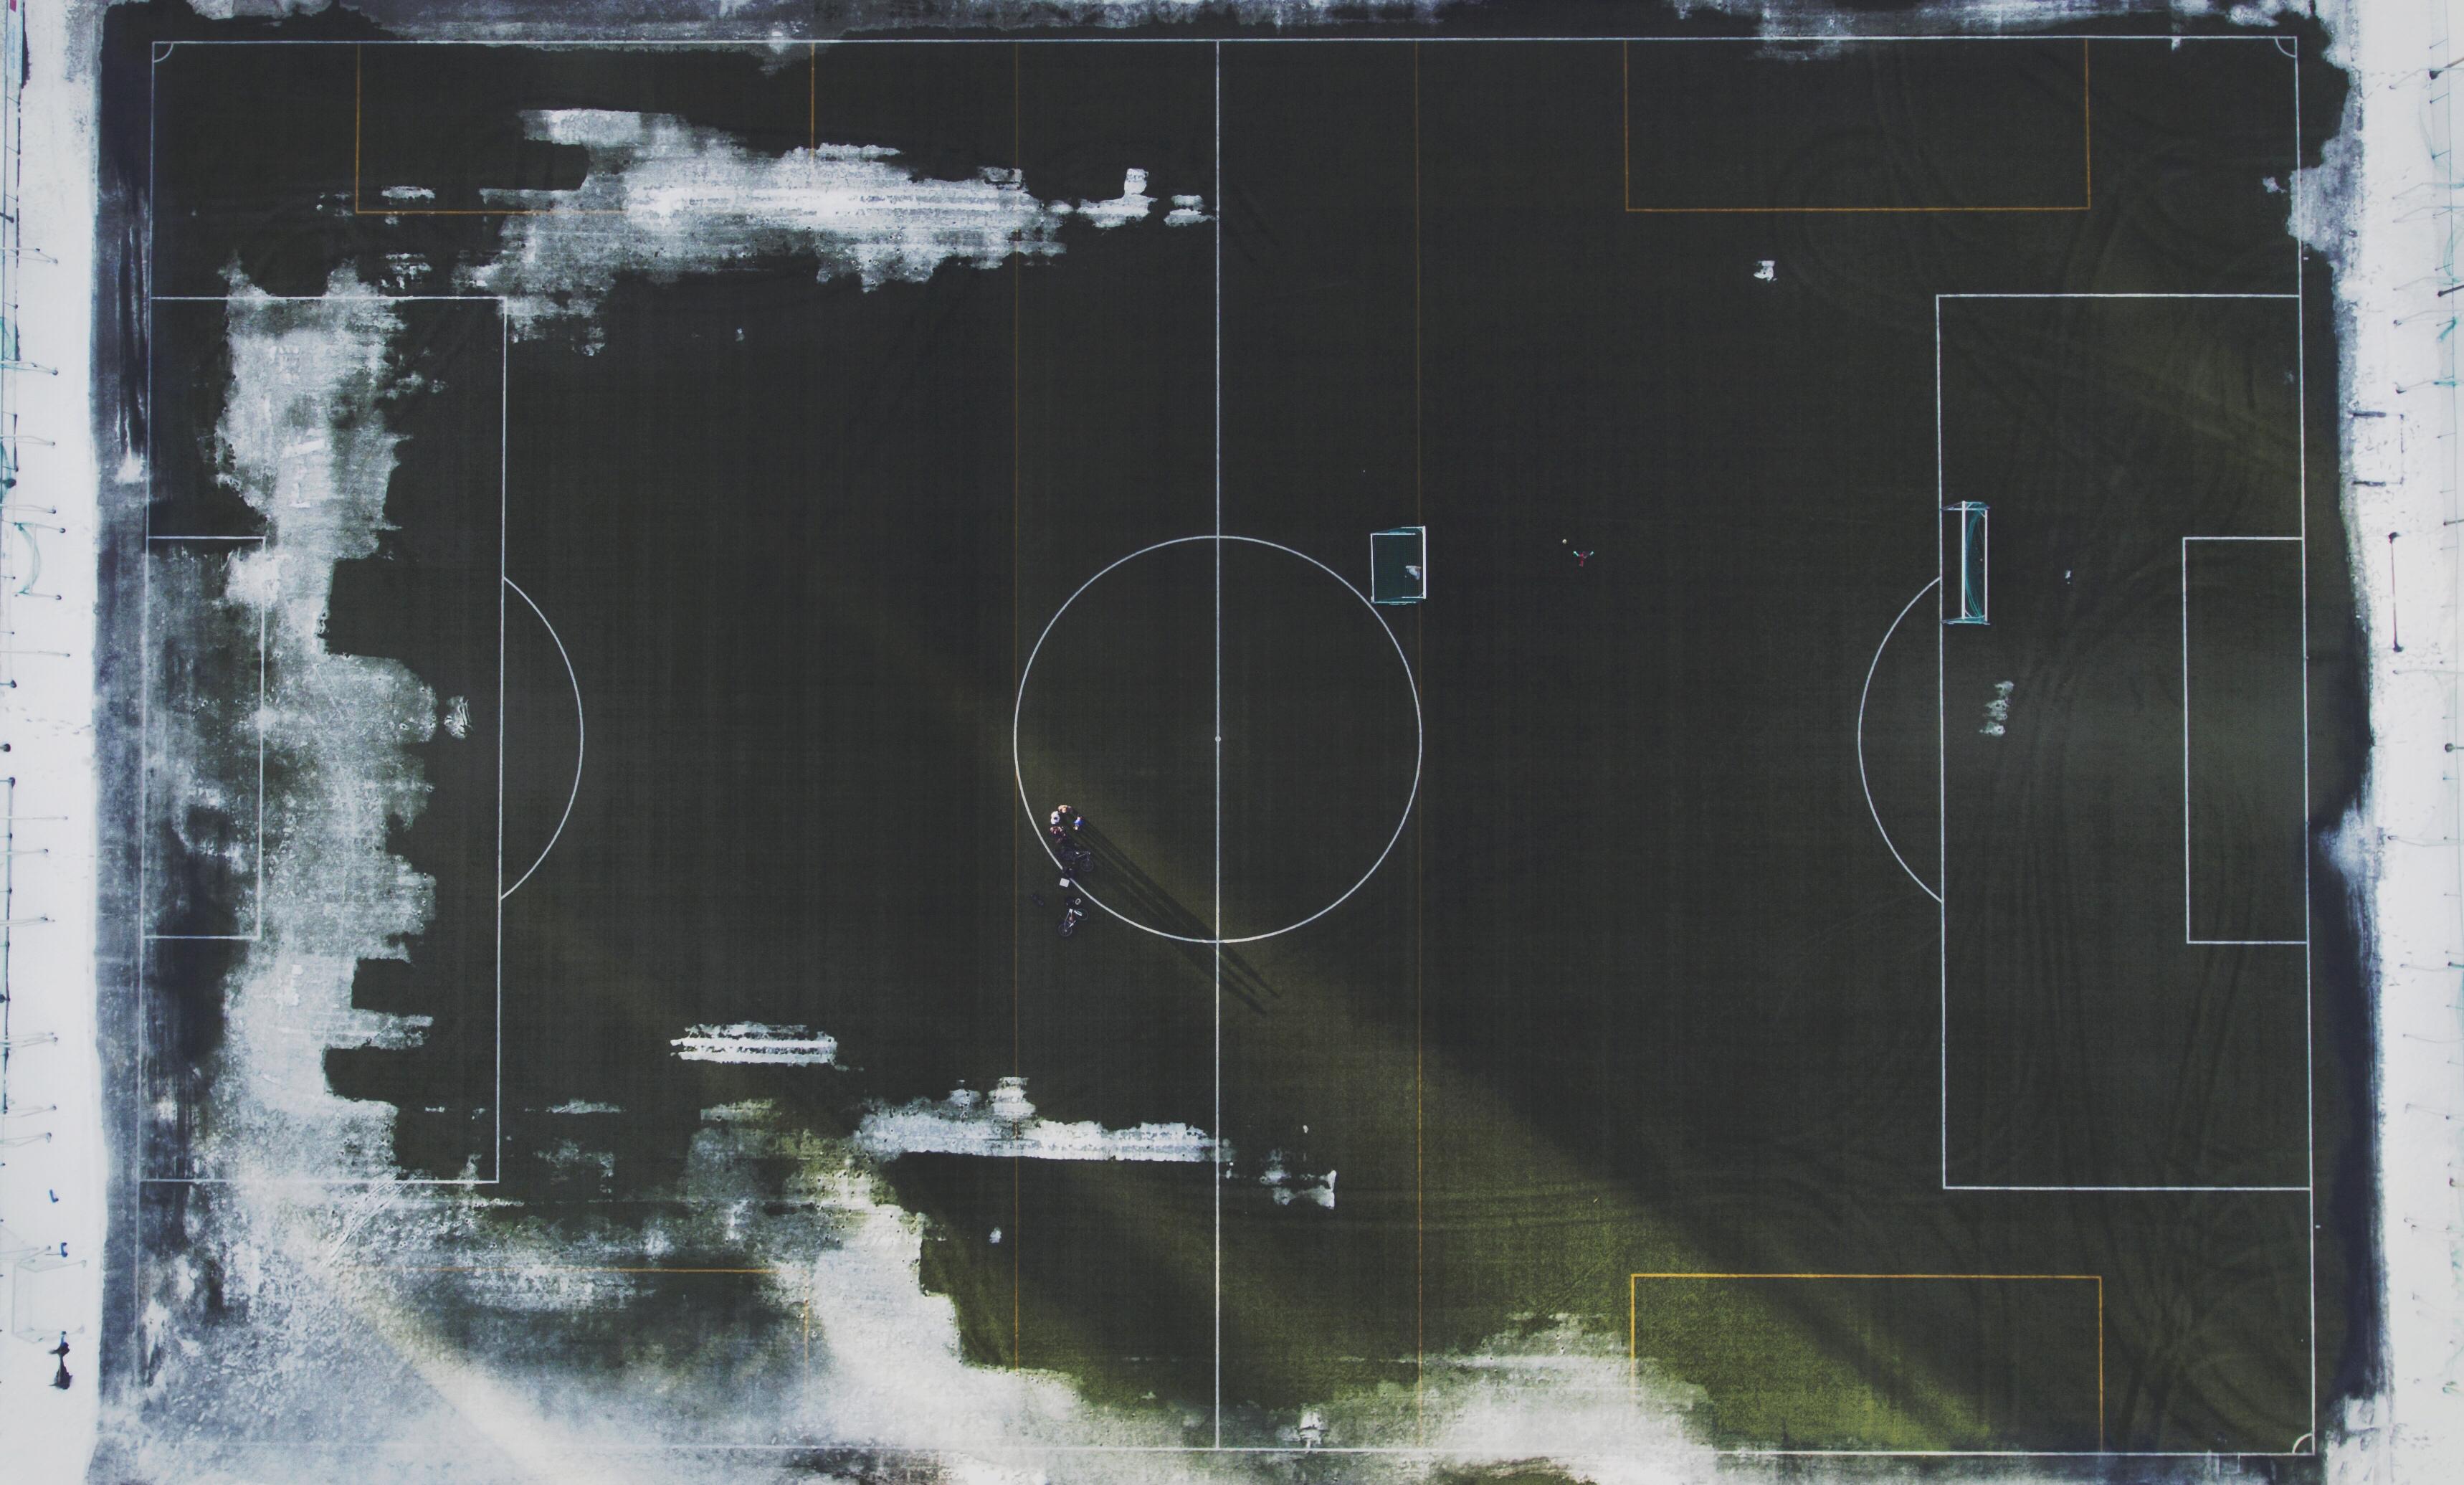 Fotos gratis  pared campo de ftbol dibujo Deportes campo de